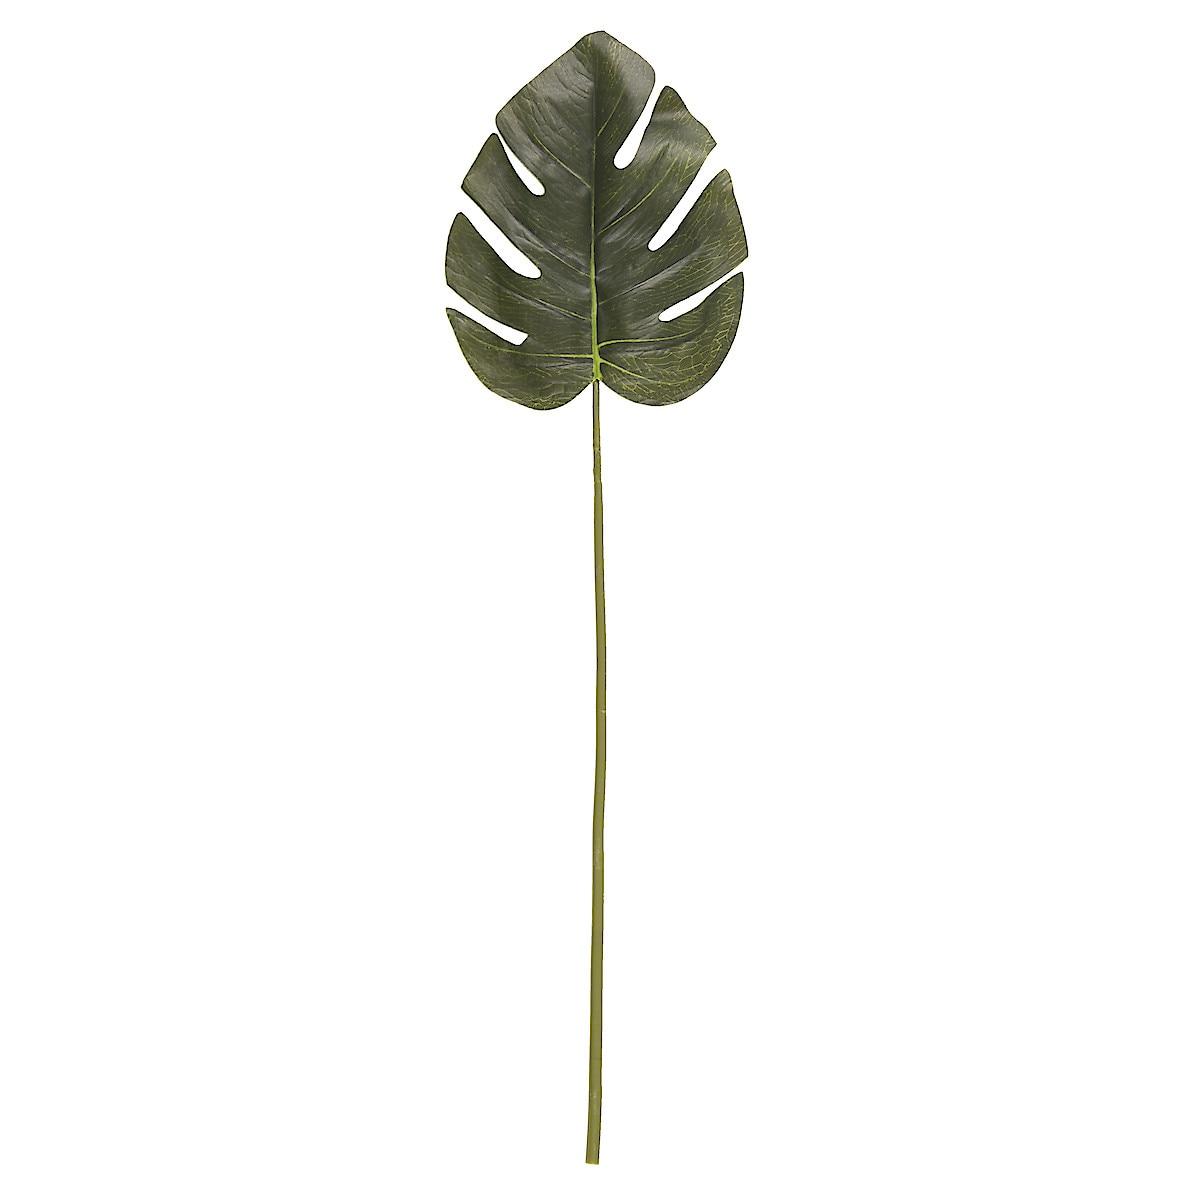 66 cm Artificial Monstera Leaf